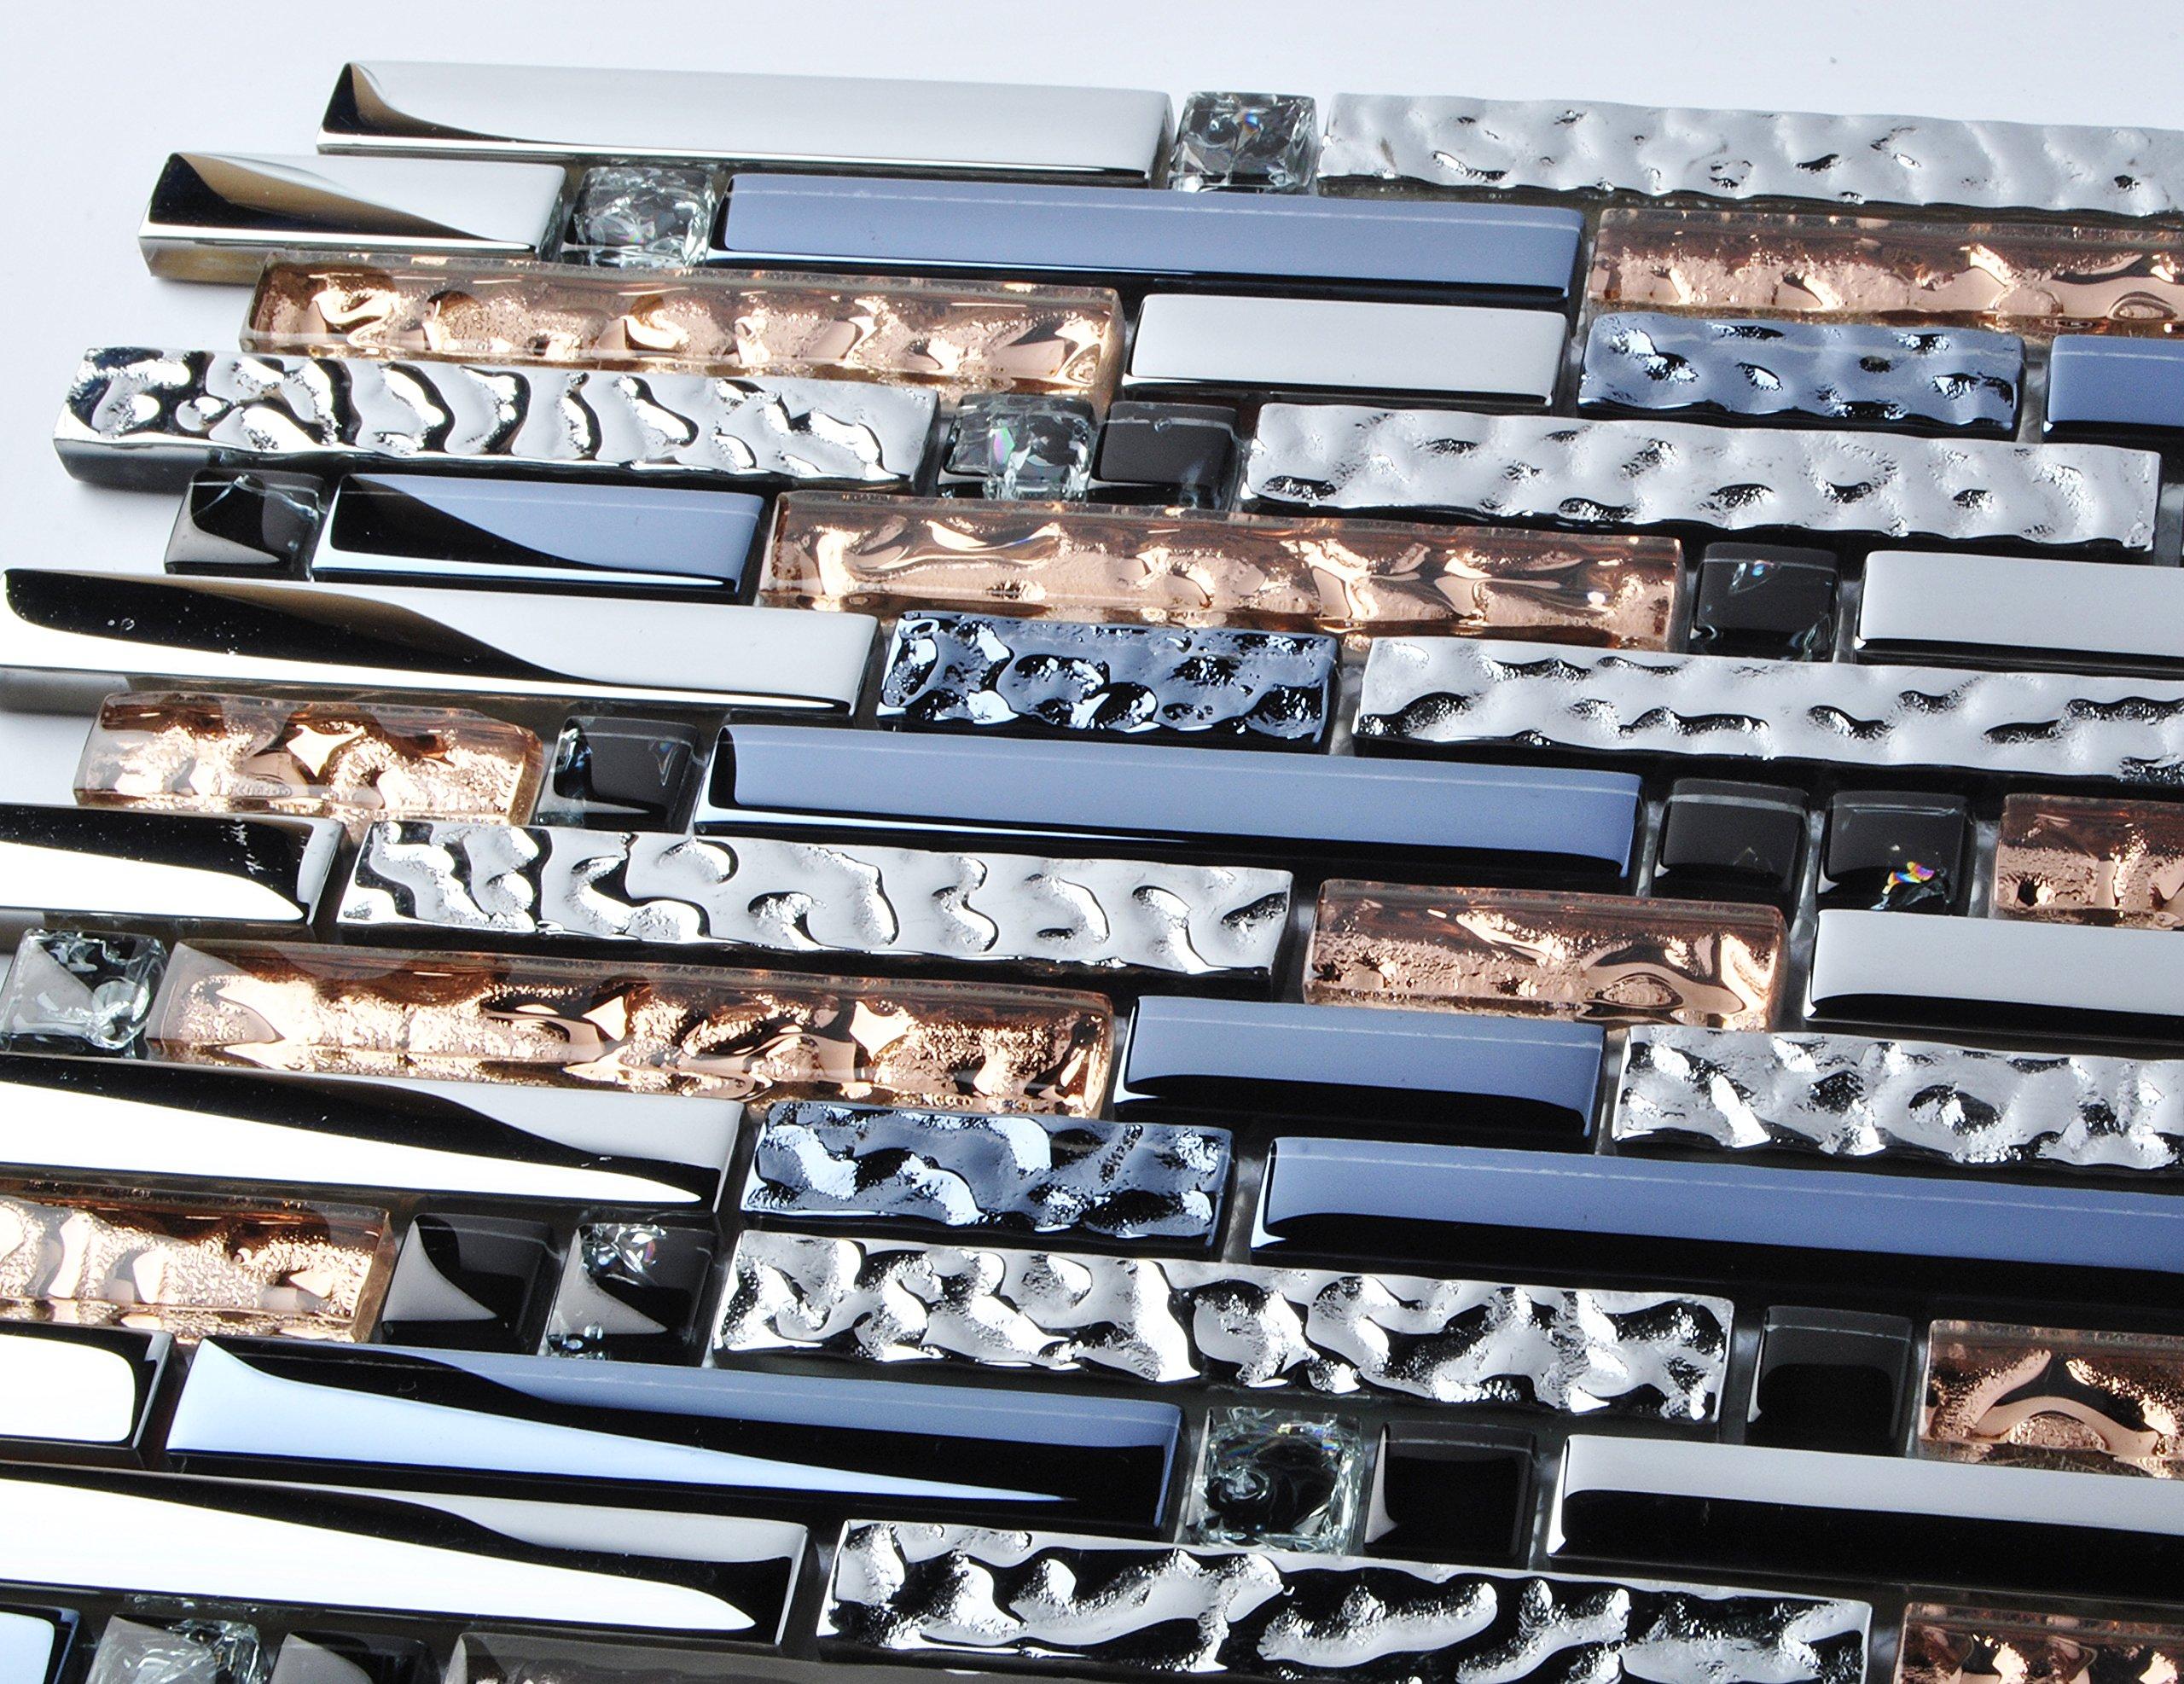 TST Mosaic Tiles Crystal Glass Tile Interlocking Black Brown Mosaic Bath Kitchen Fireplace Decor TSTGT107 (5 PCS [12'' X 12''/Each]) by TST MOSAIC TILES (Image #6)